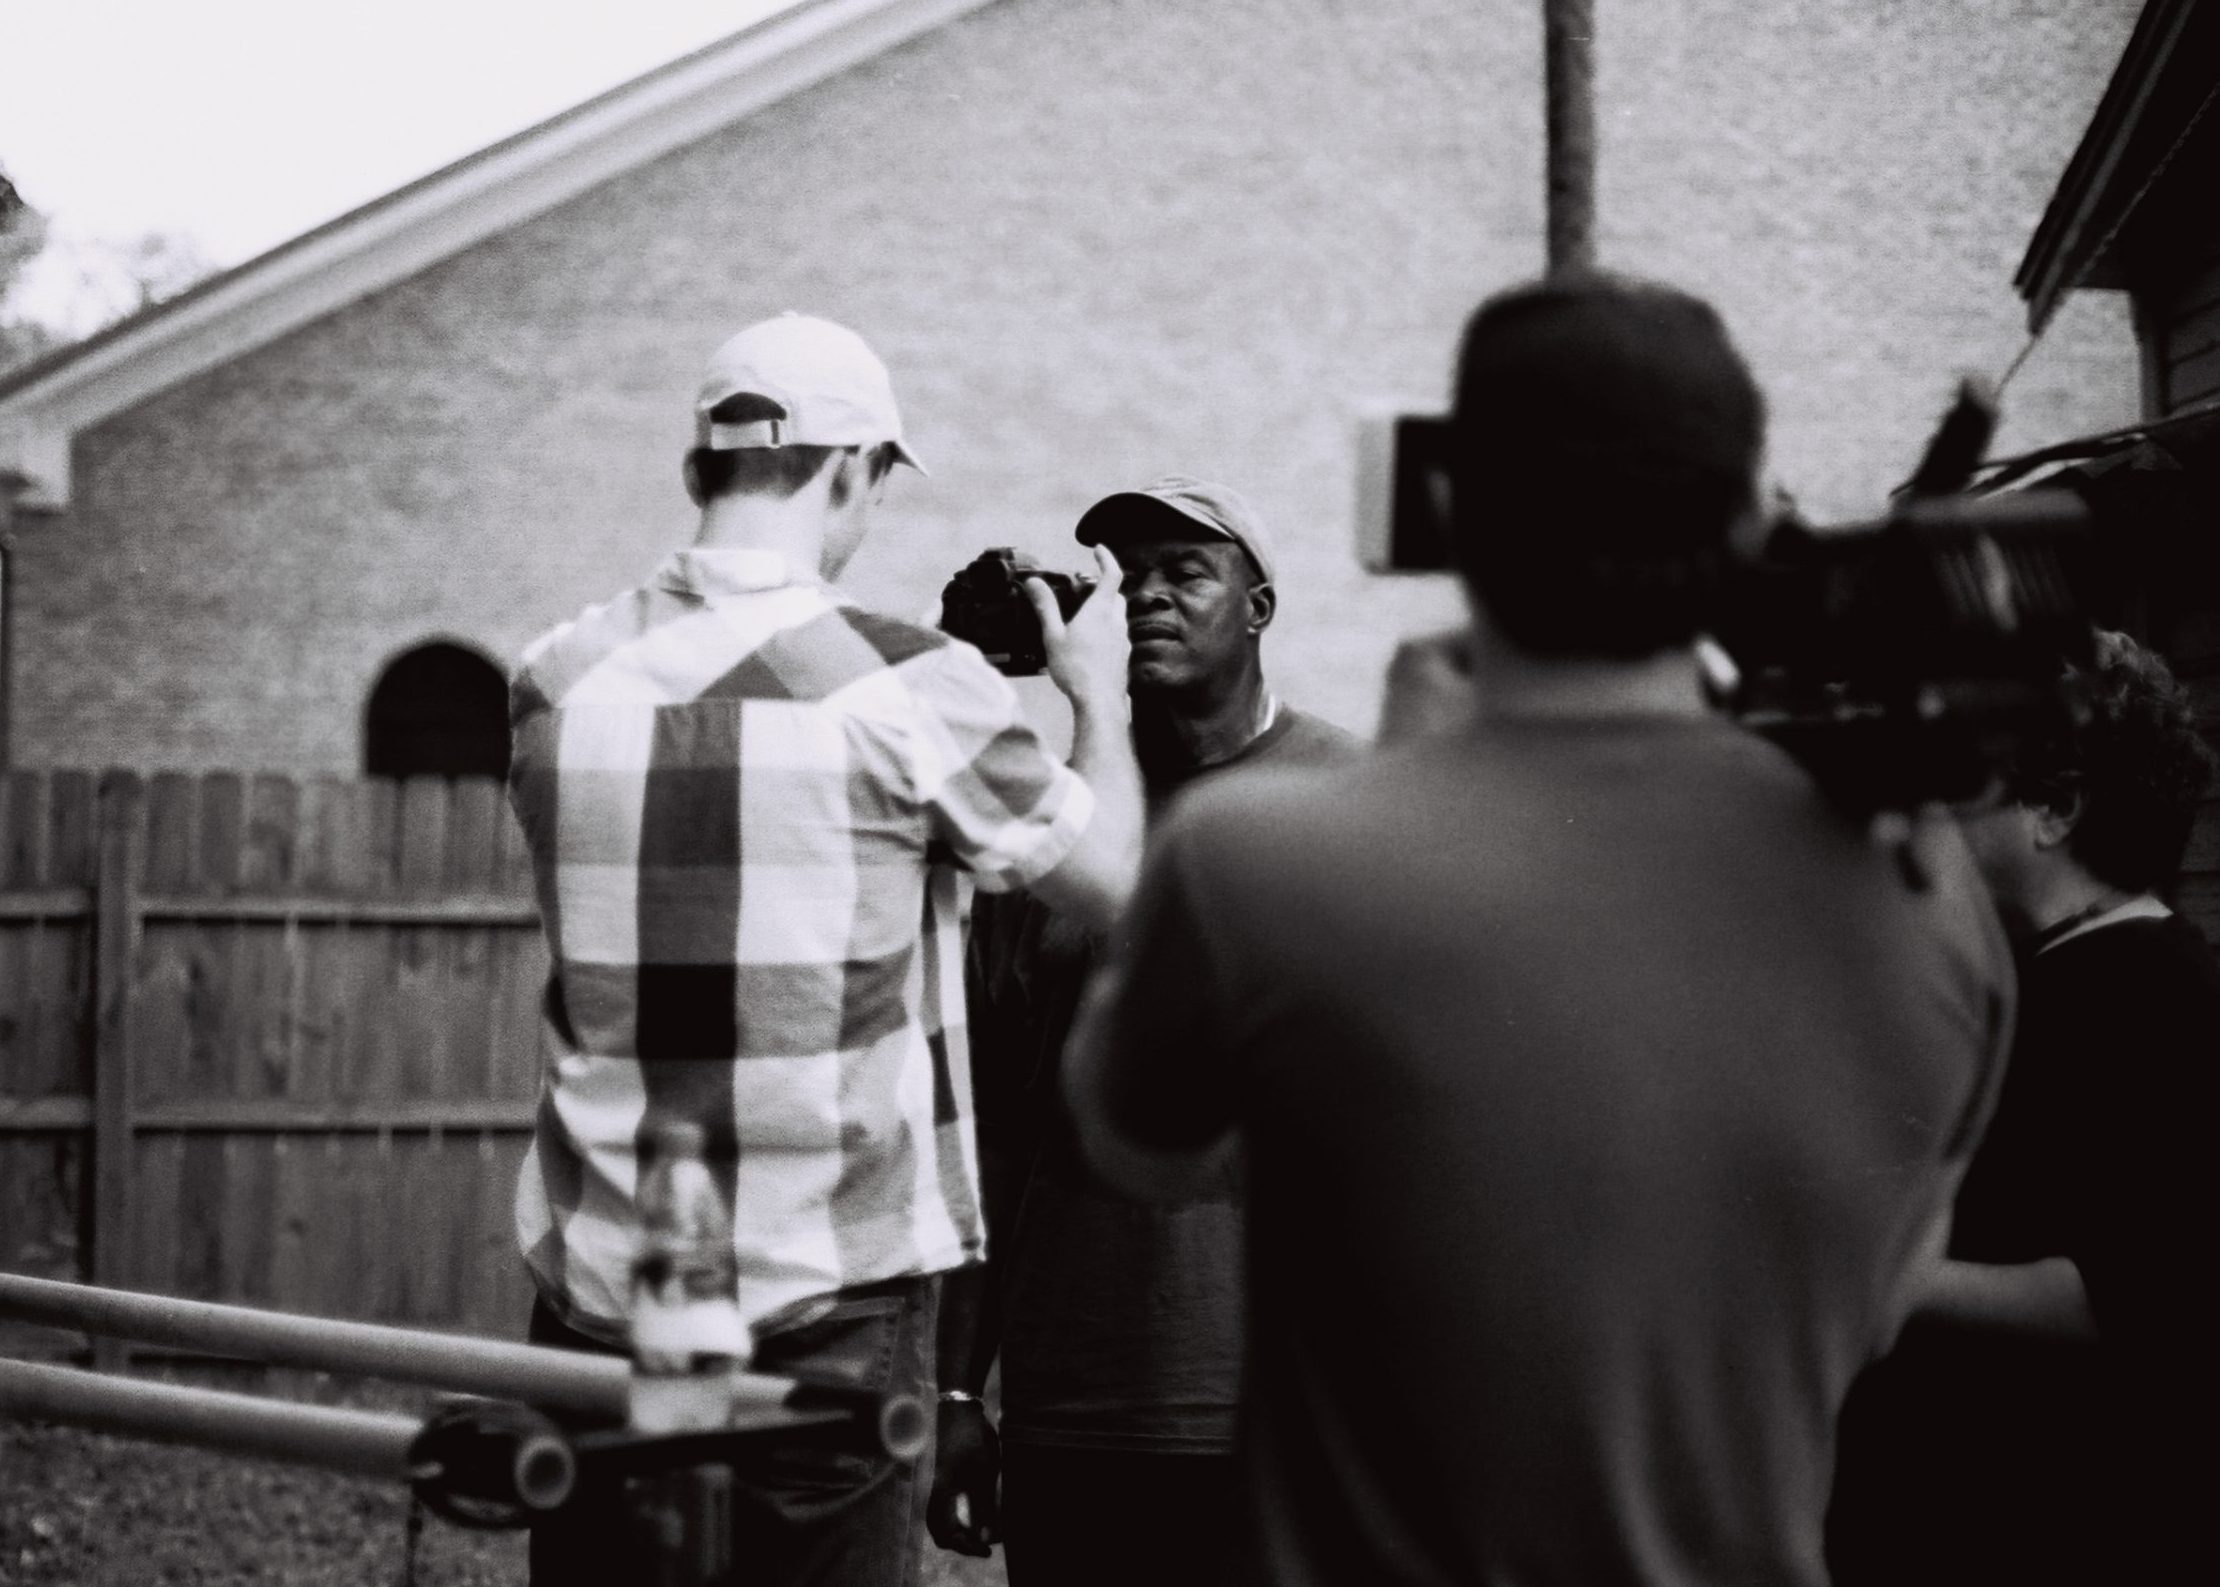 Bookers_Place_Photos_by_Danielle_Andersen_Joe_Russell_Joe_Victorine_Leroy_Jones